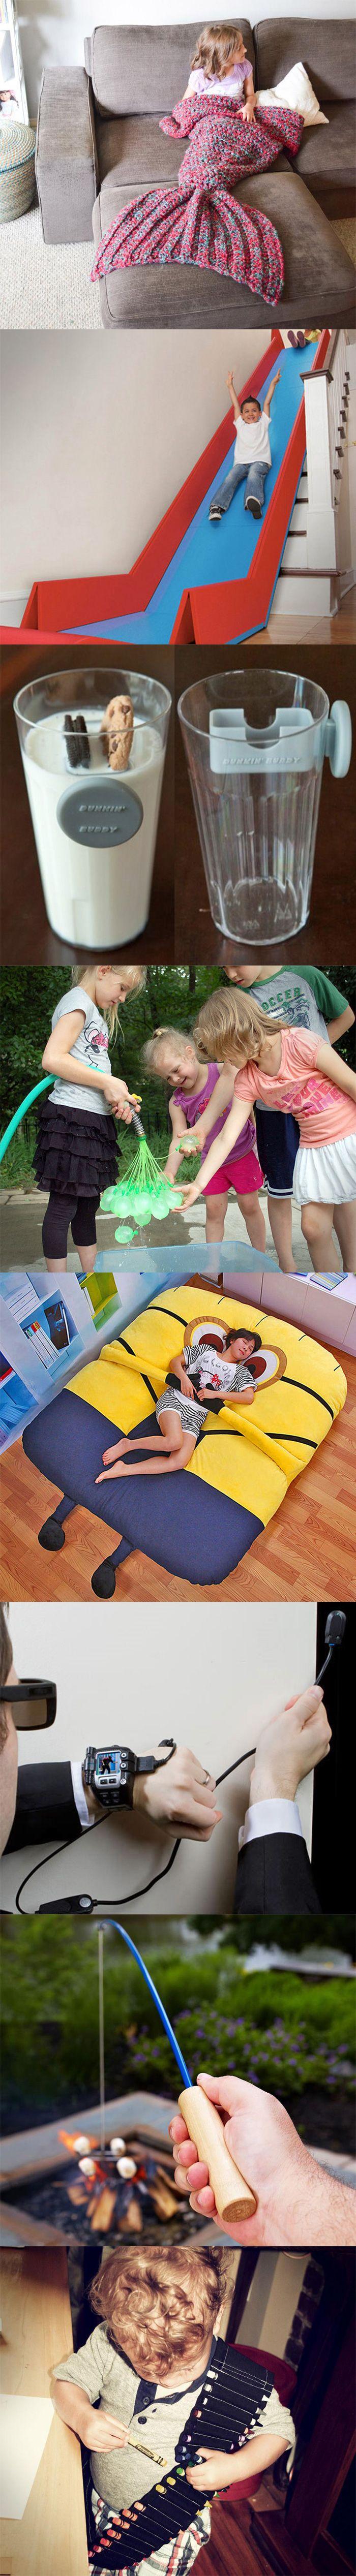 30 Unique Gift Ideas For Kids